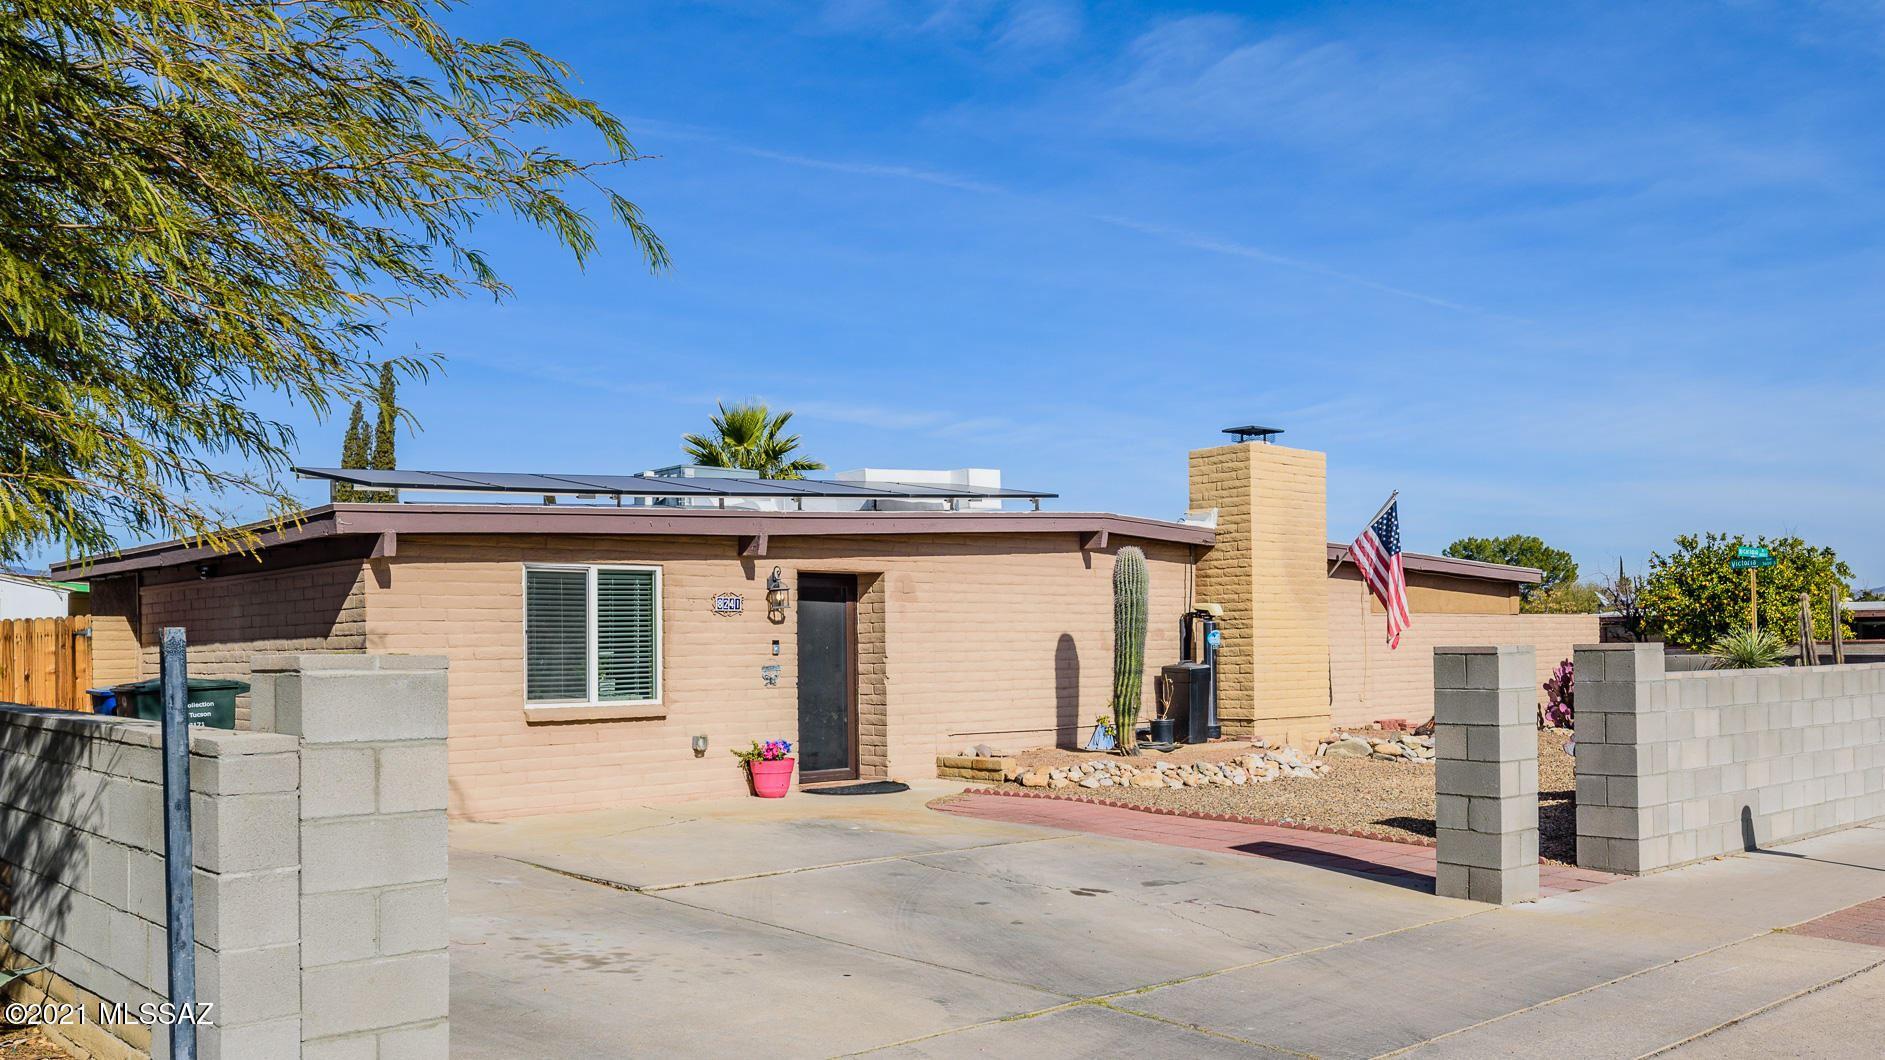 8241 E Nicaragua Drive, Tucson, AZ 85730 - MLS#: 22101353